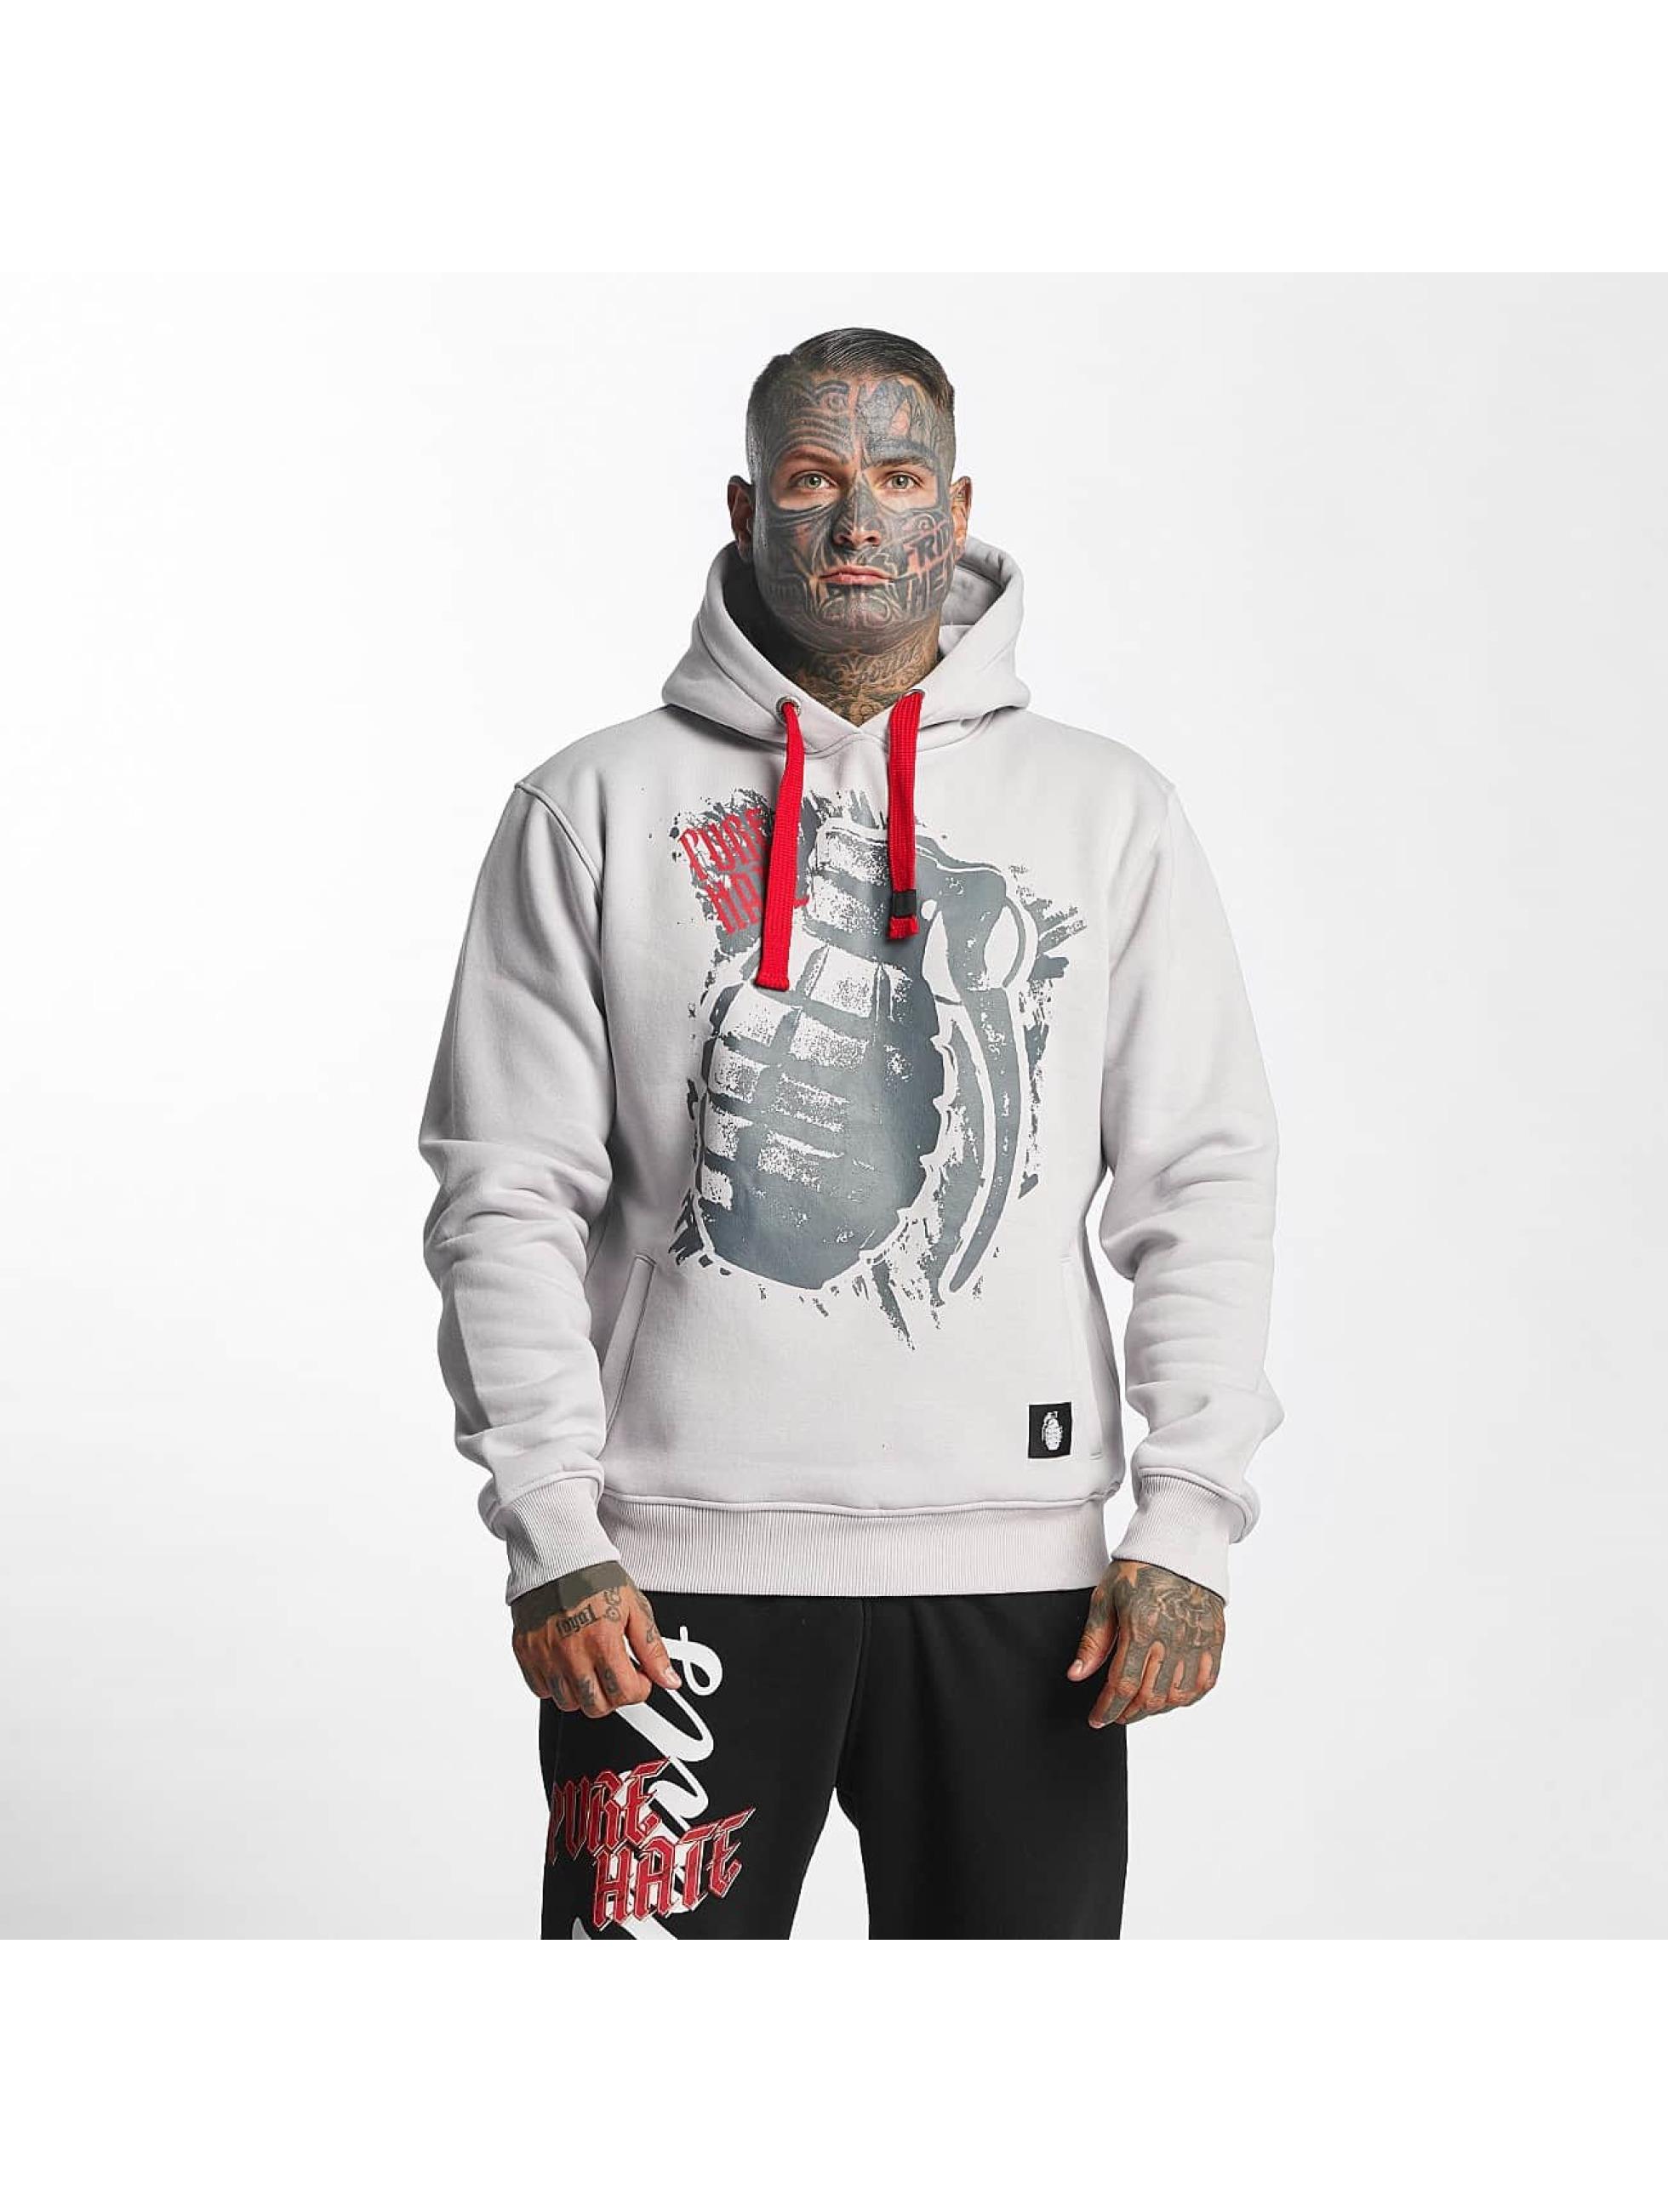 Pure Hate Hoodie Hand Grenade gray